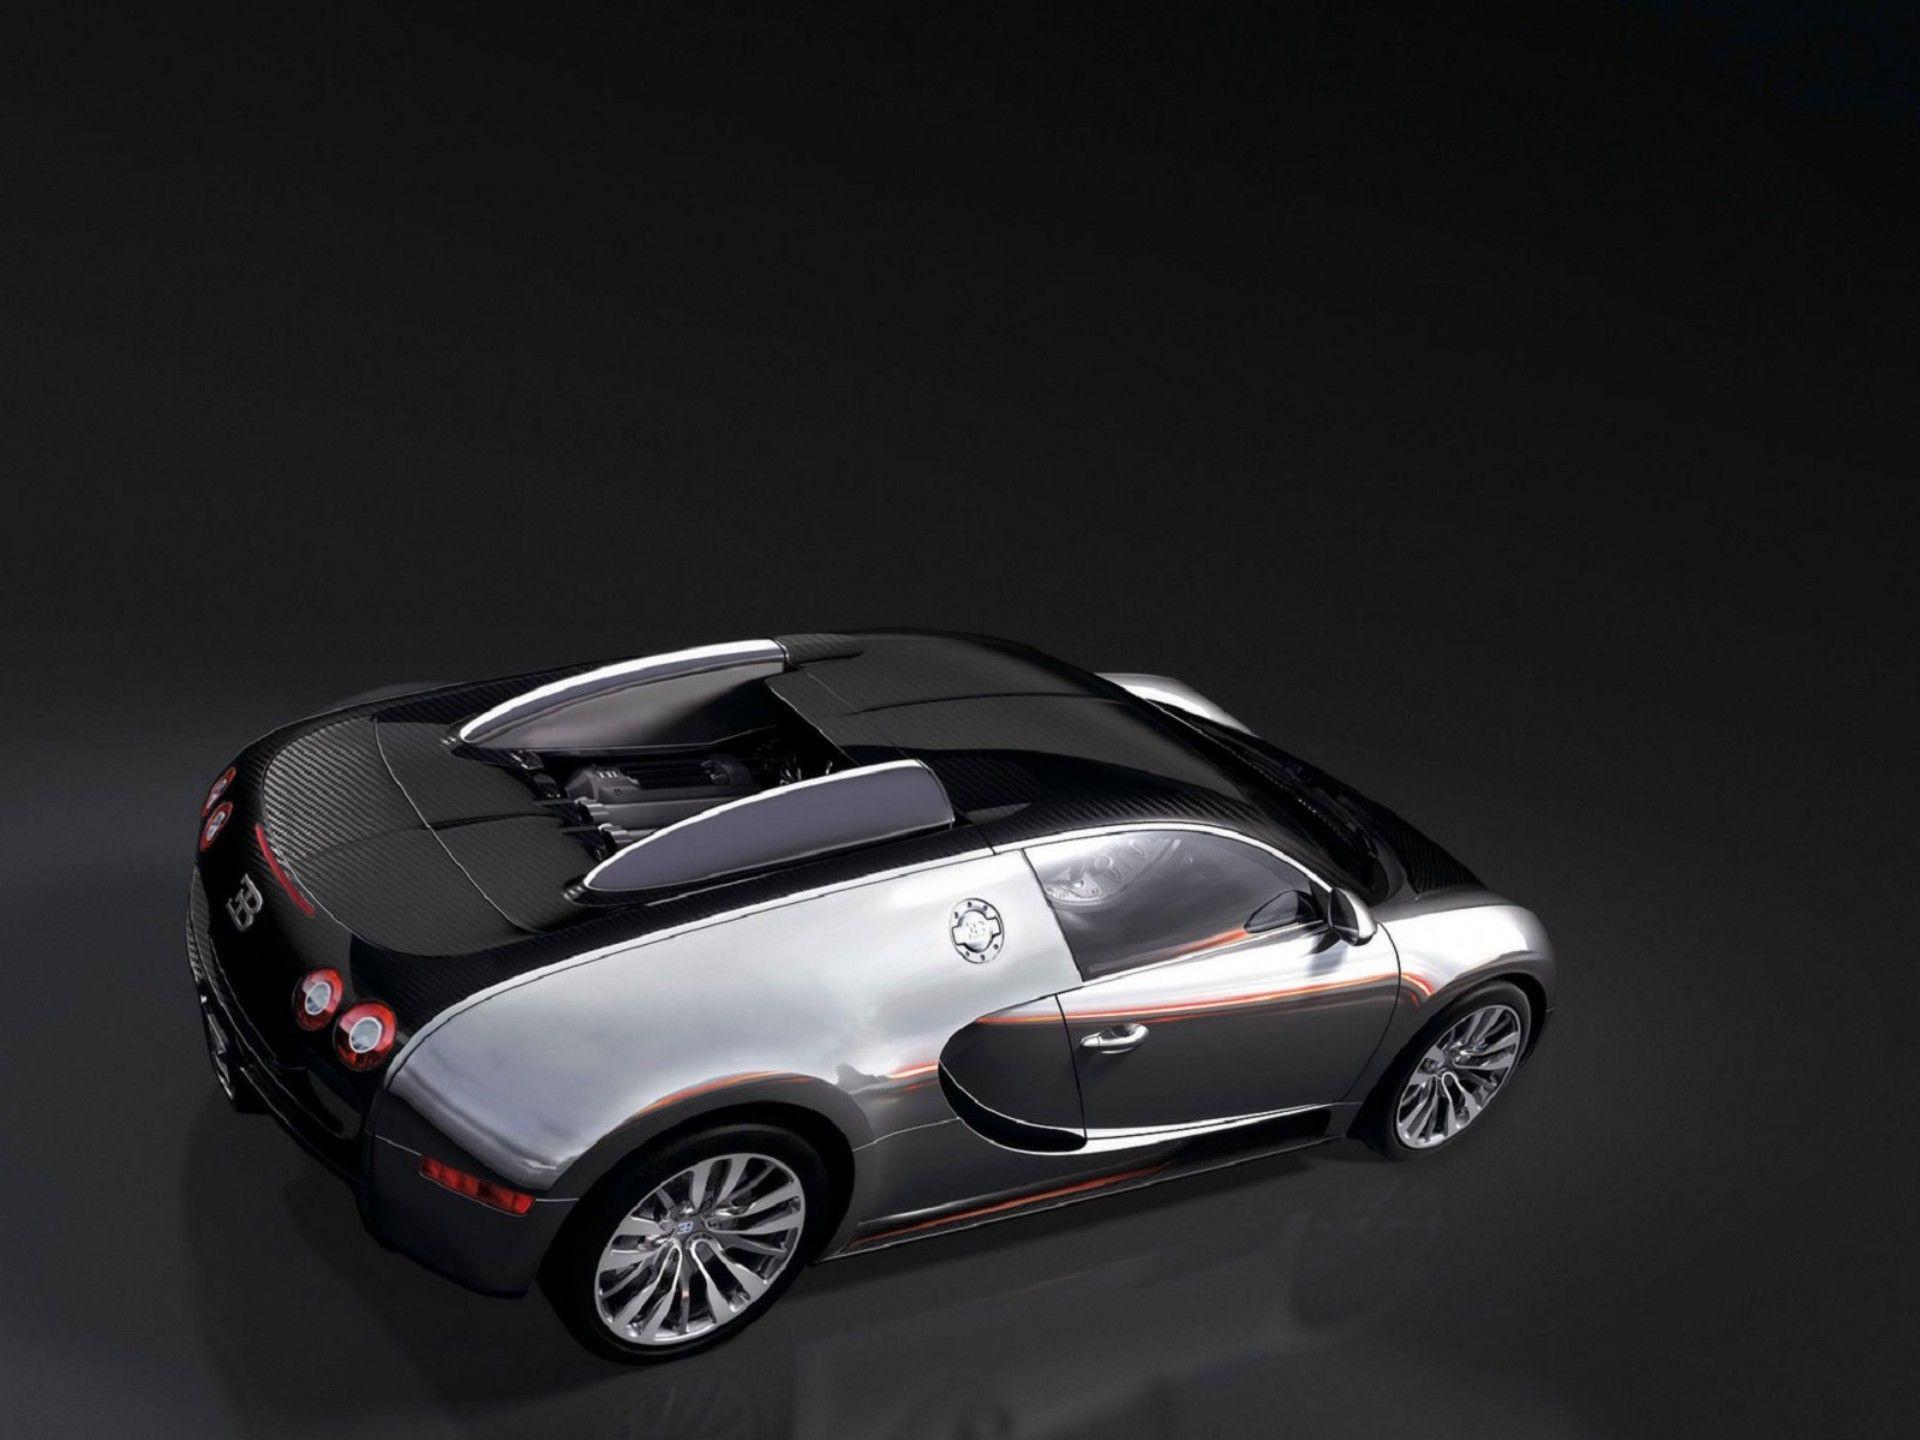 53f5f7bb1a56748c5d25e6a2f2914937 Extraordinary Bugatti Veyron Price In Bangladesh Cars Trend